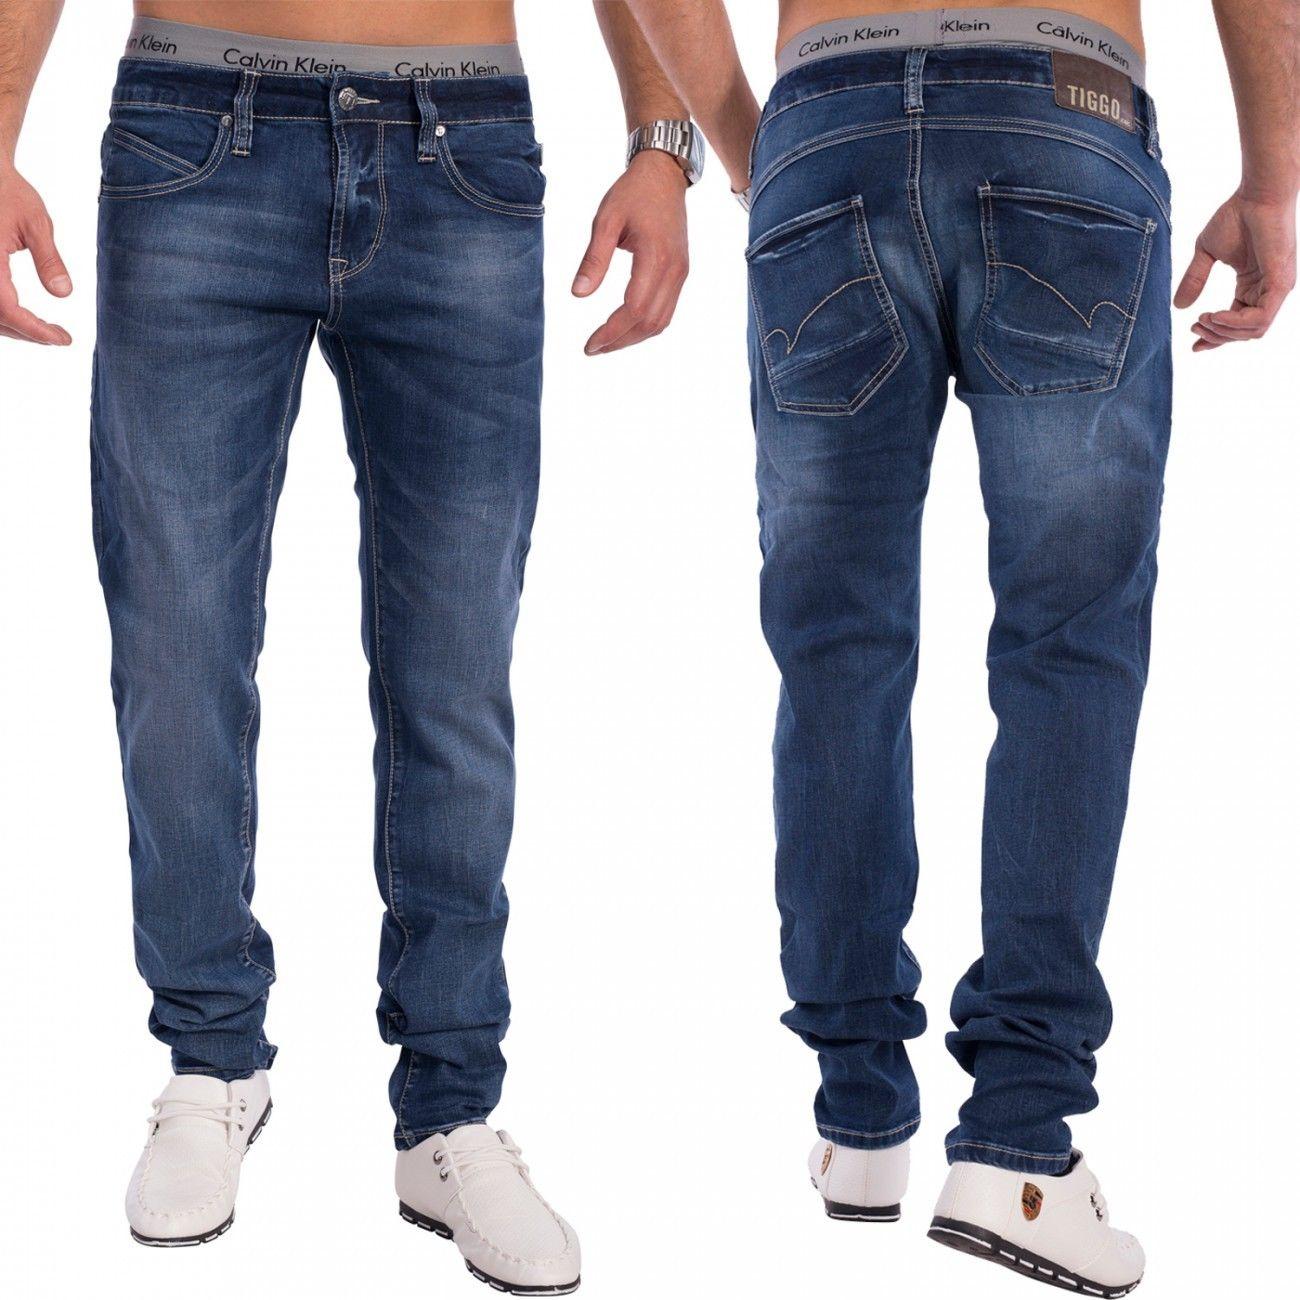 Herren Slim Tapered Fit Jeans Denim dunkelblau Jeanshose Hose stretch